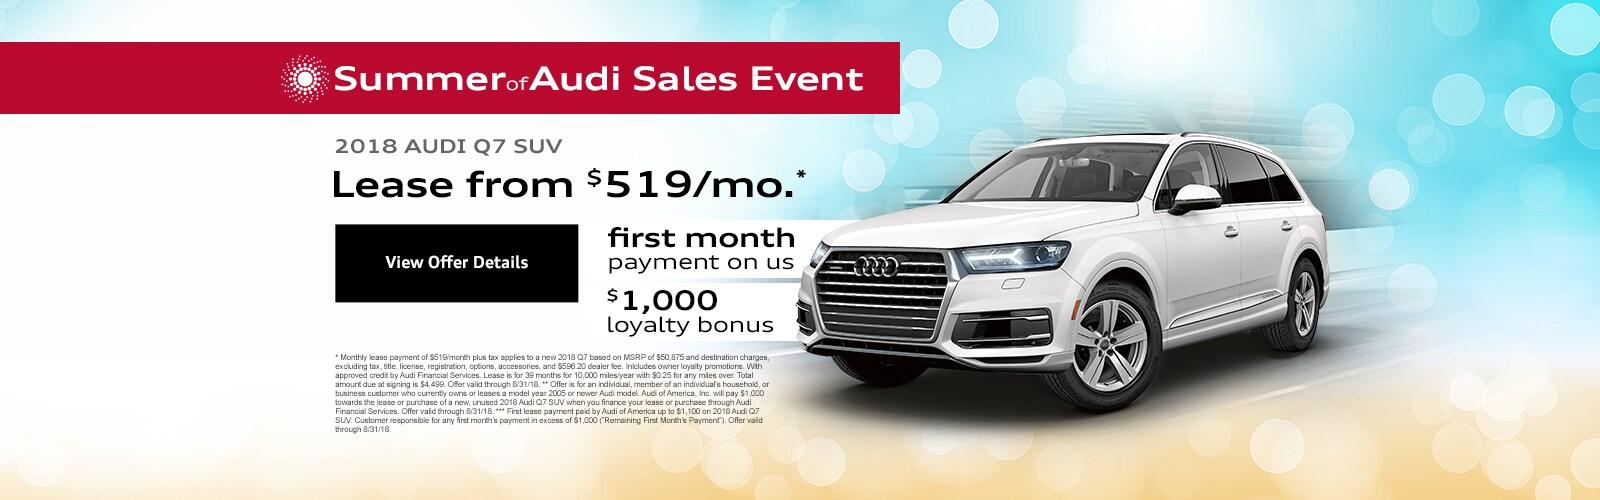 Tampa Audi Dealers Wwwtheminecraftservercom Best Resume Templates - Audi tampa